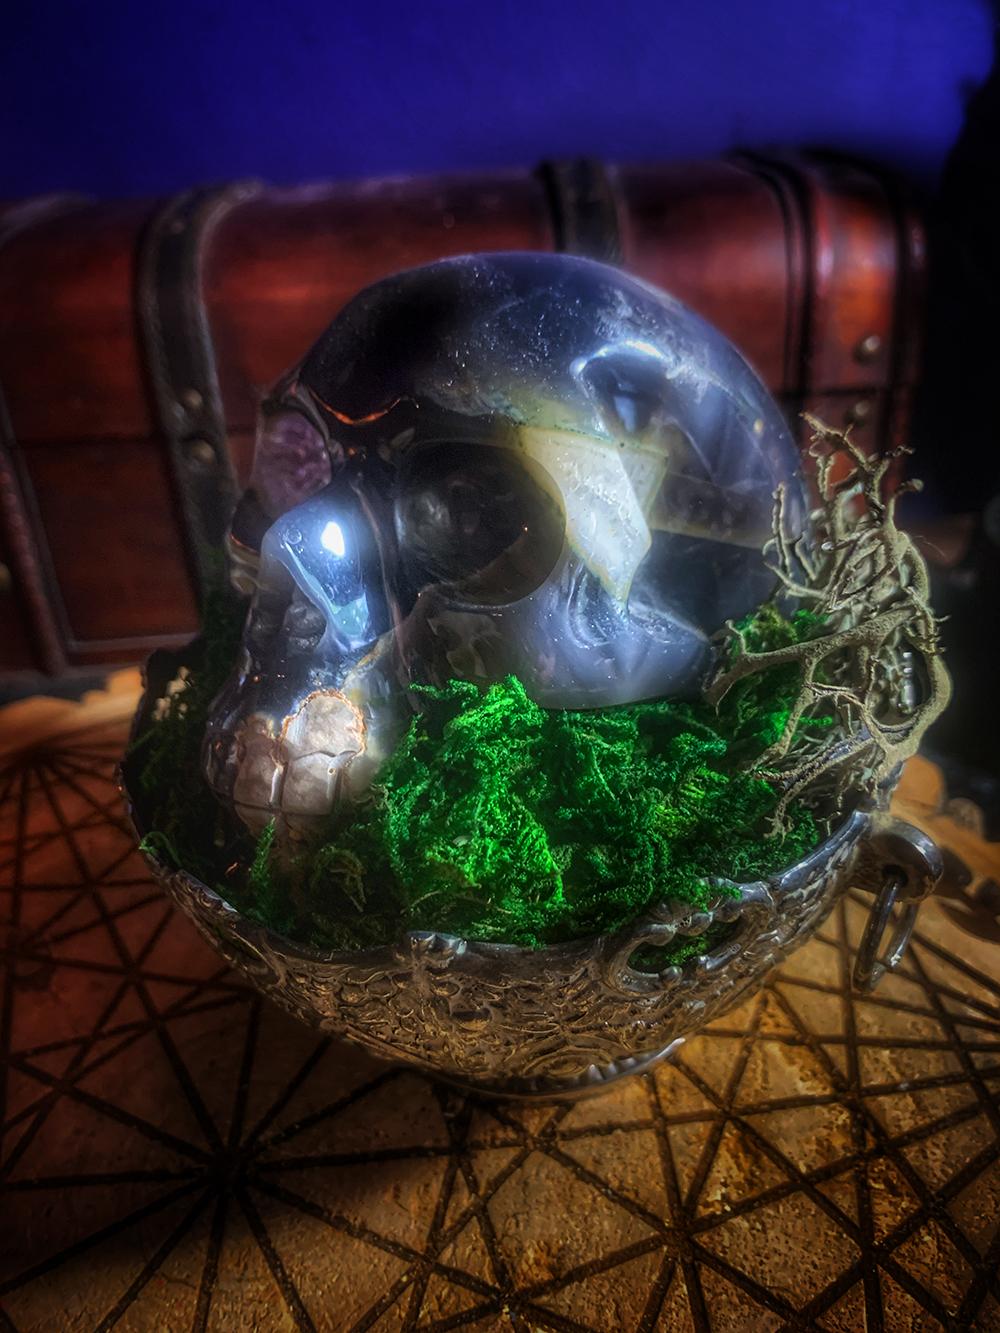 The Ritual Druzy Agate Altar Skull